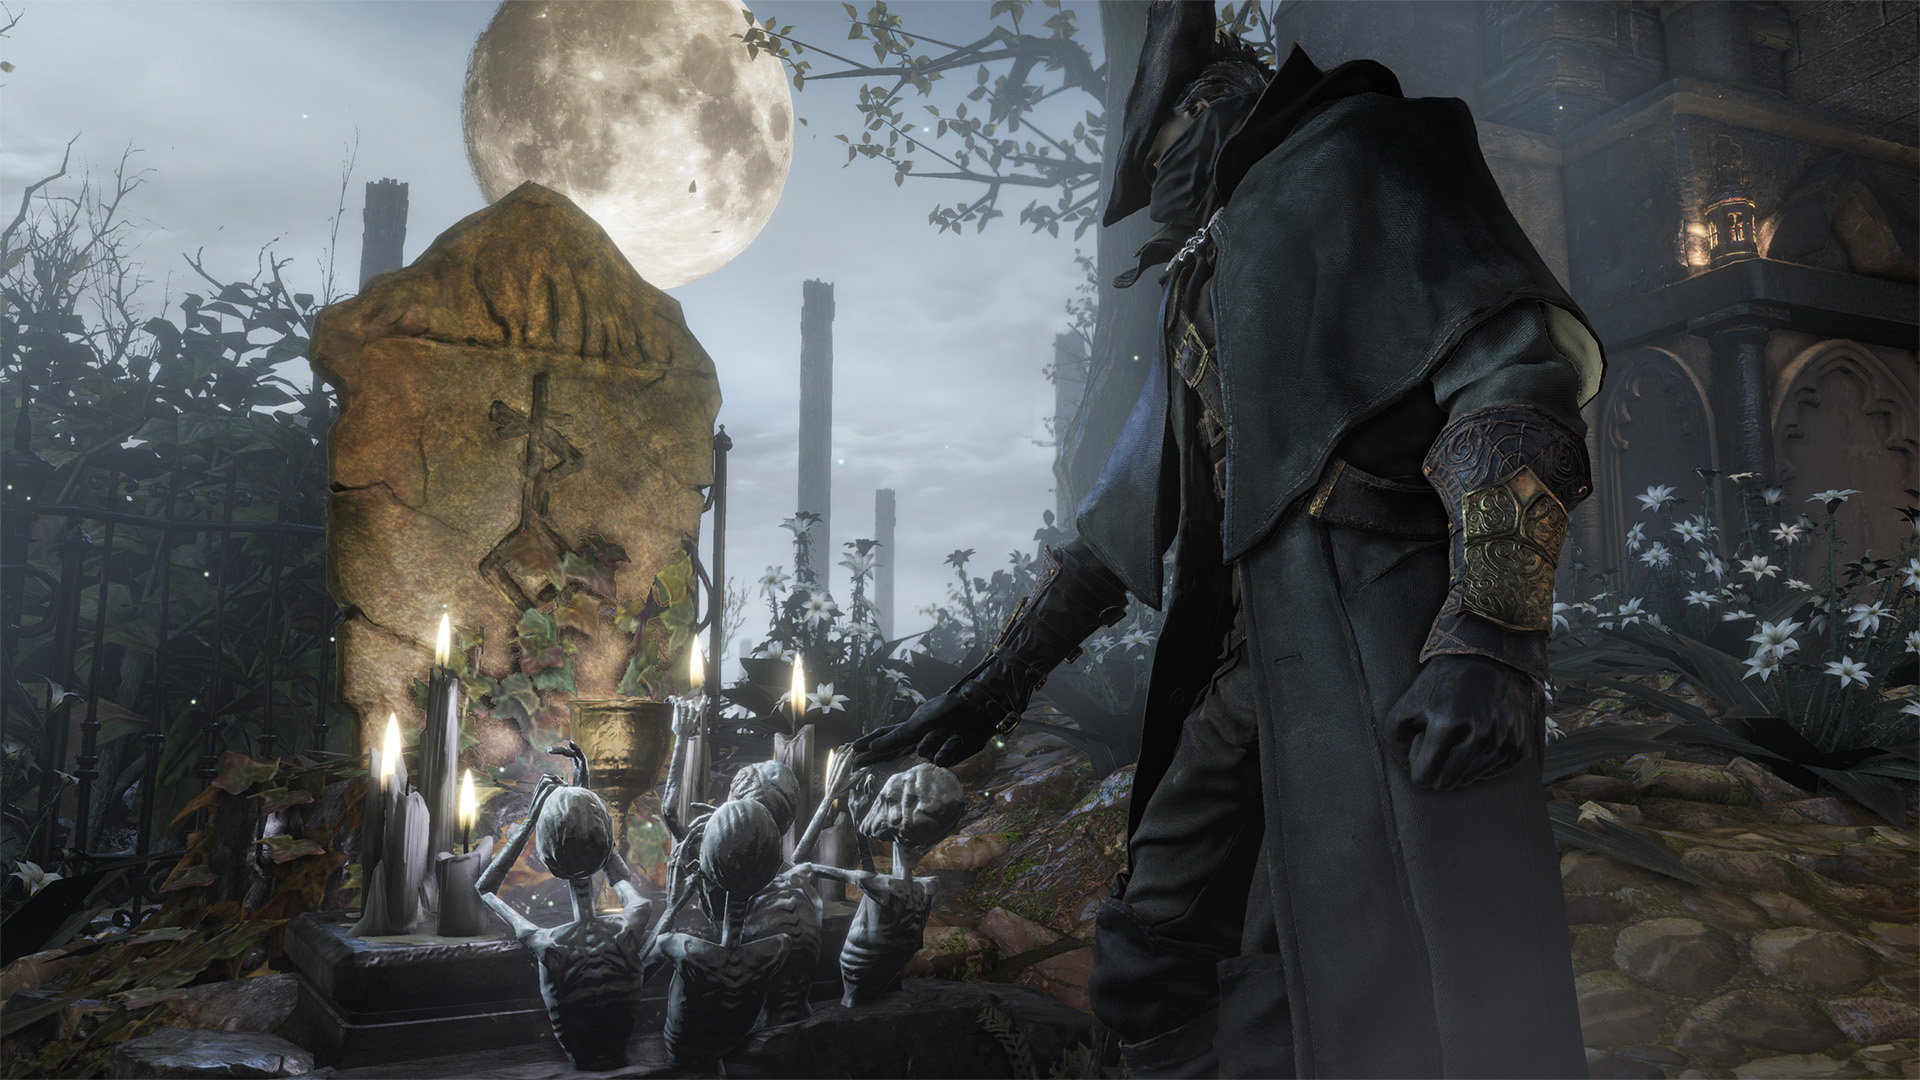 bloodborne-chalice-dungeon-screen-01-ps4